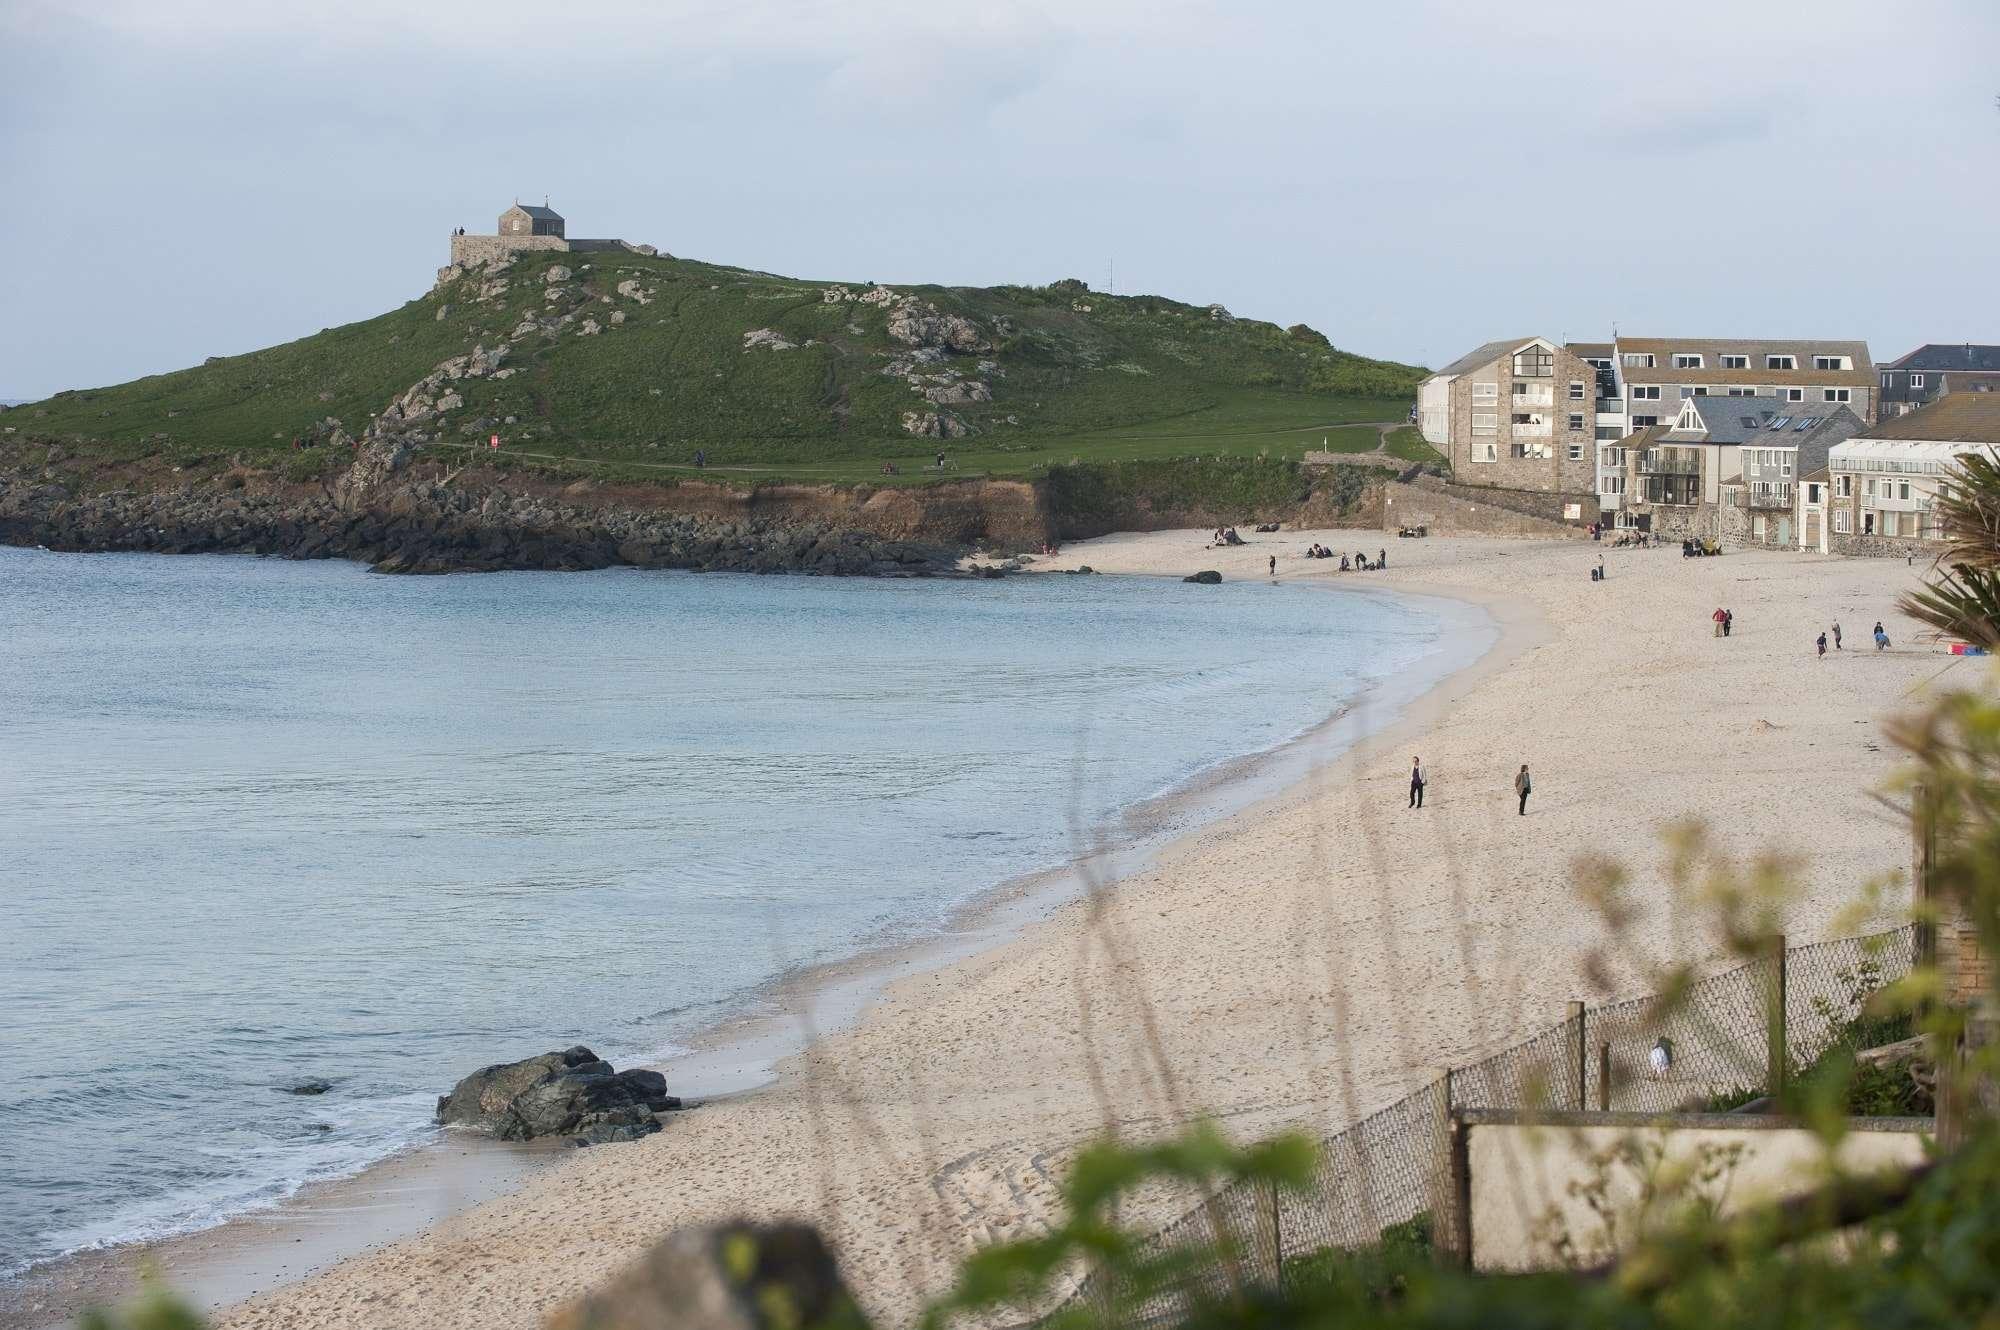 image of Porthmeor beach at St Ives, Cornish coastal path